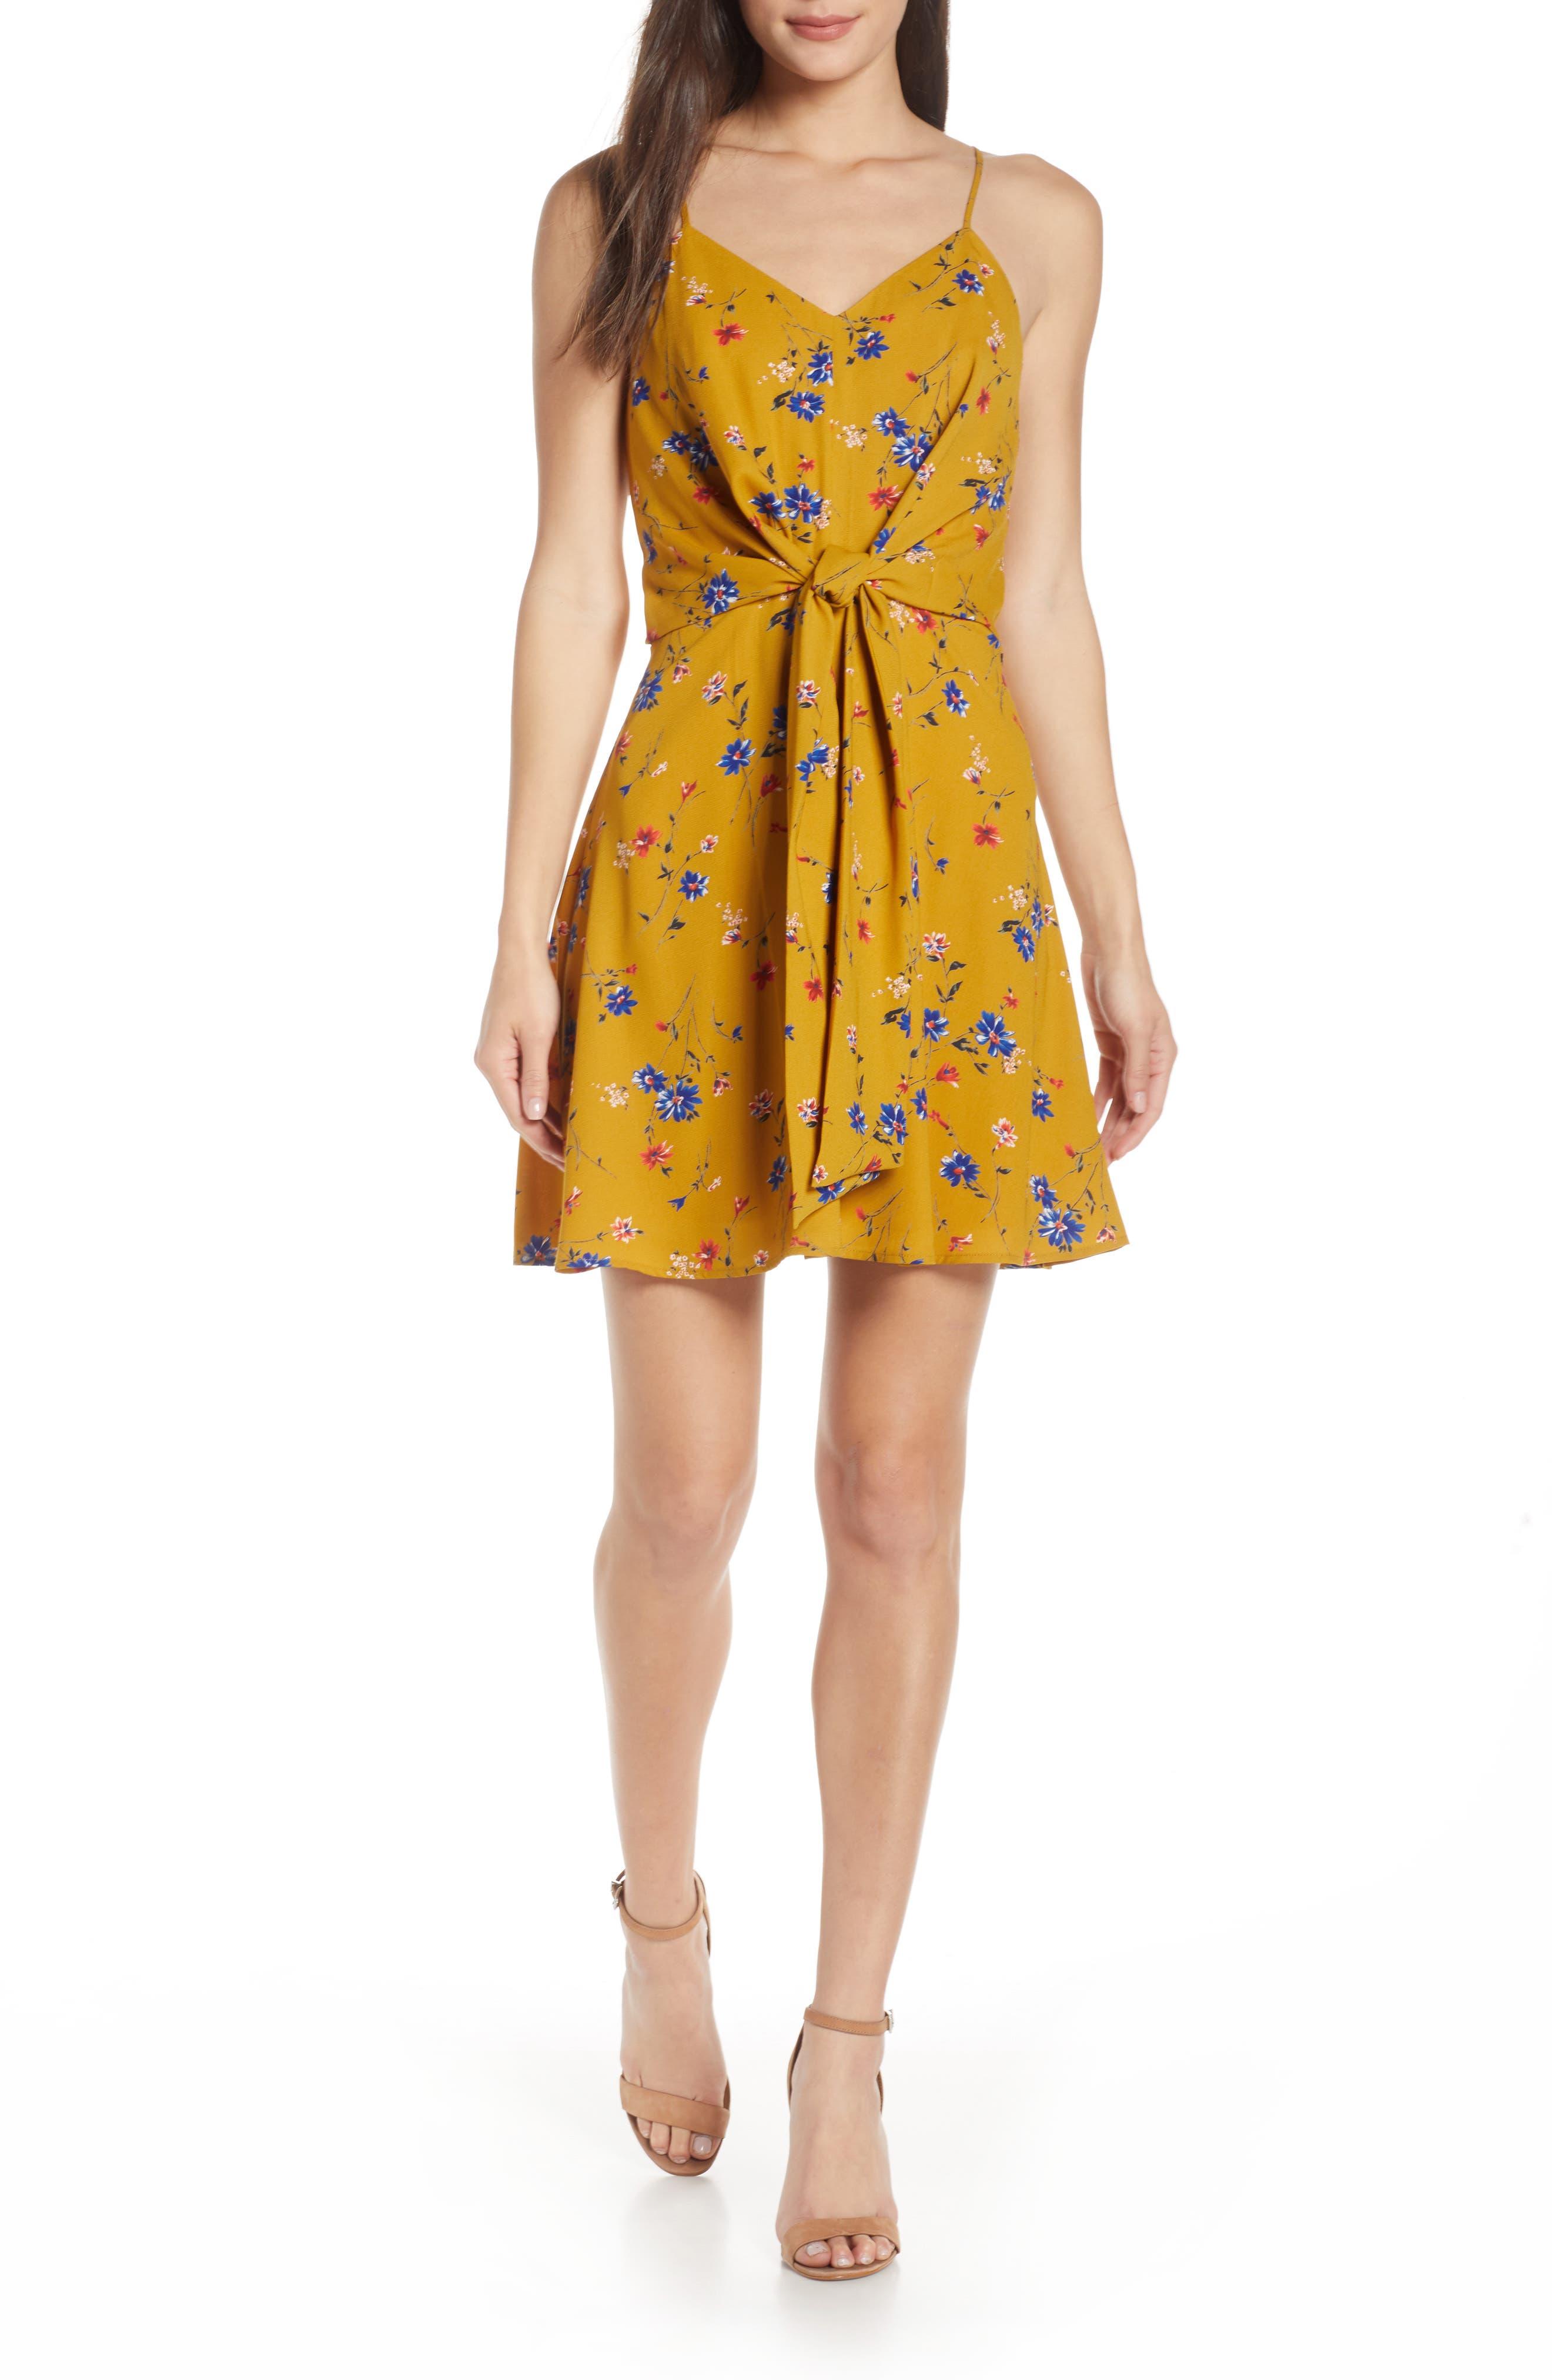 19 COOPER, Floral Print Tie Front Dress, Main thumbnail 1, color, MUSTARD FLORAL